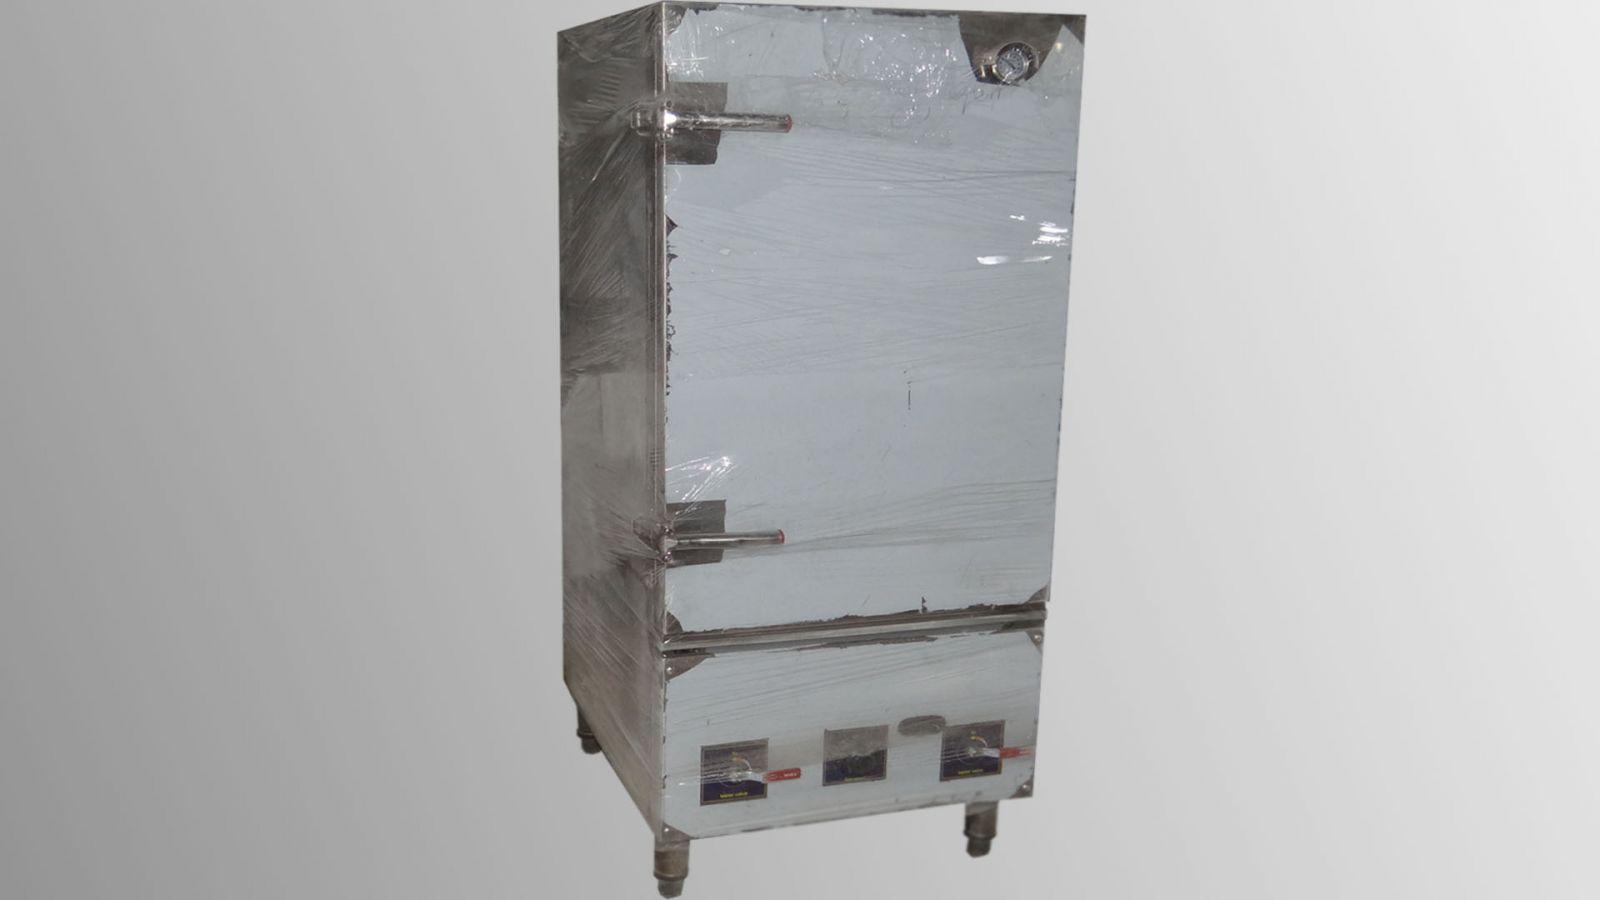 Tủ cơm công nghiệp 50kg Model SCTC - DG50